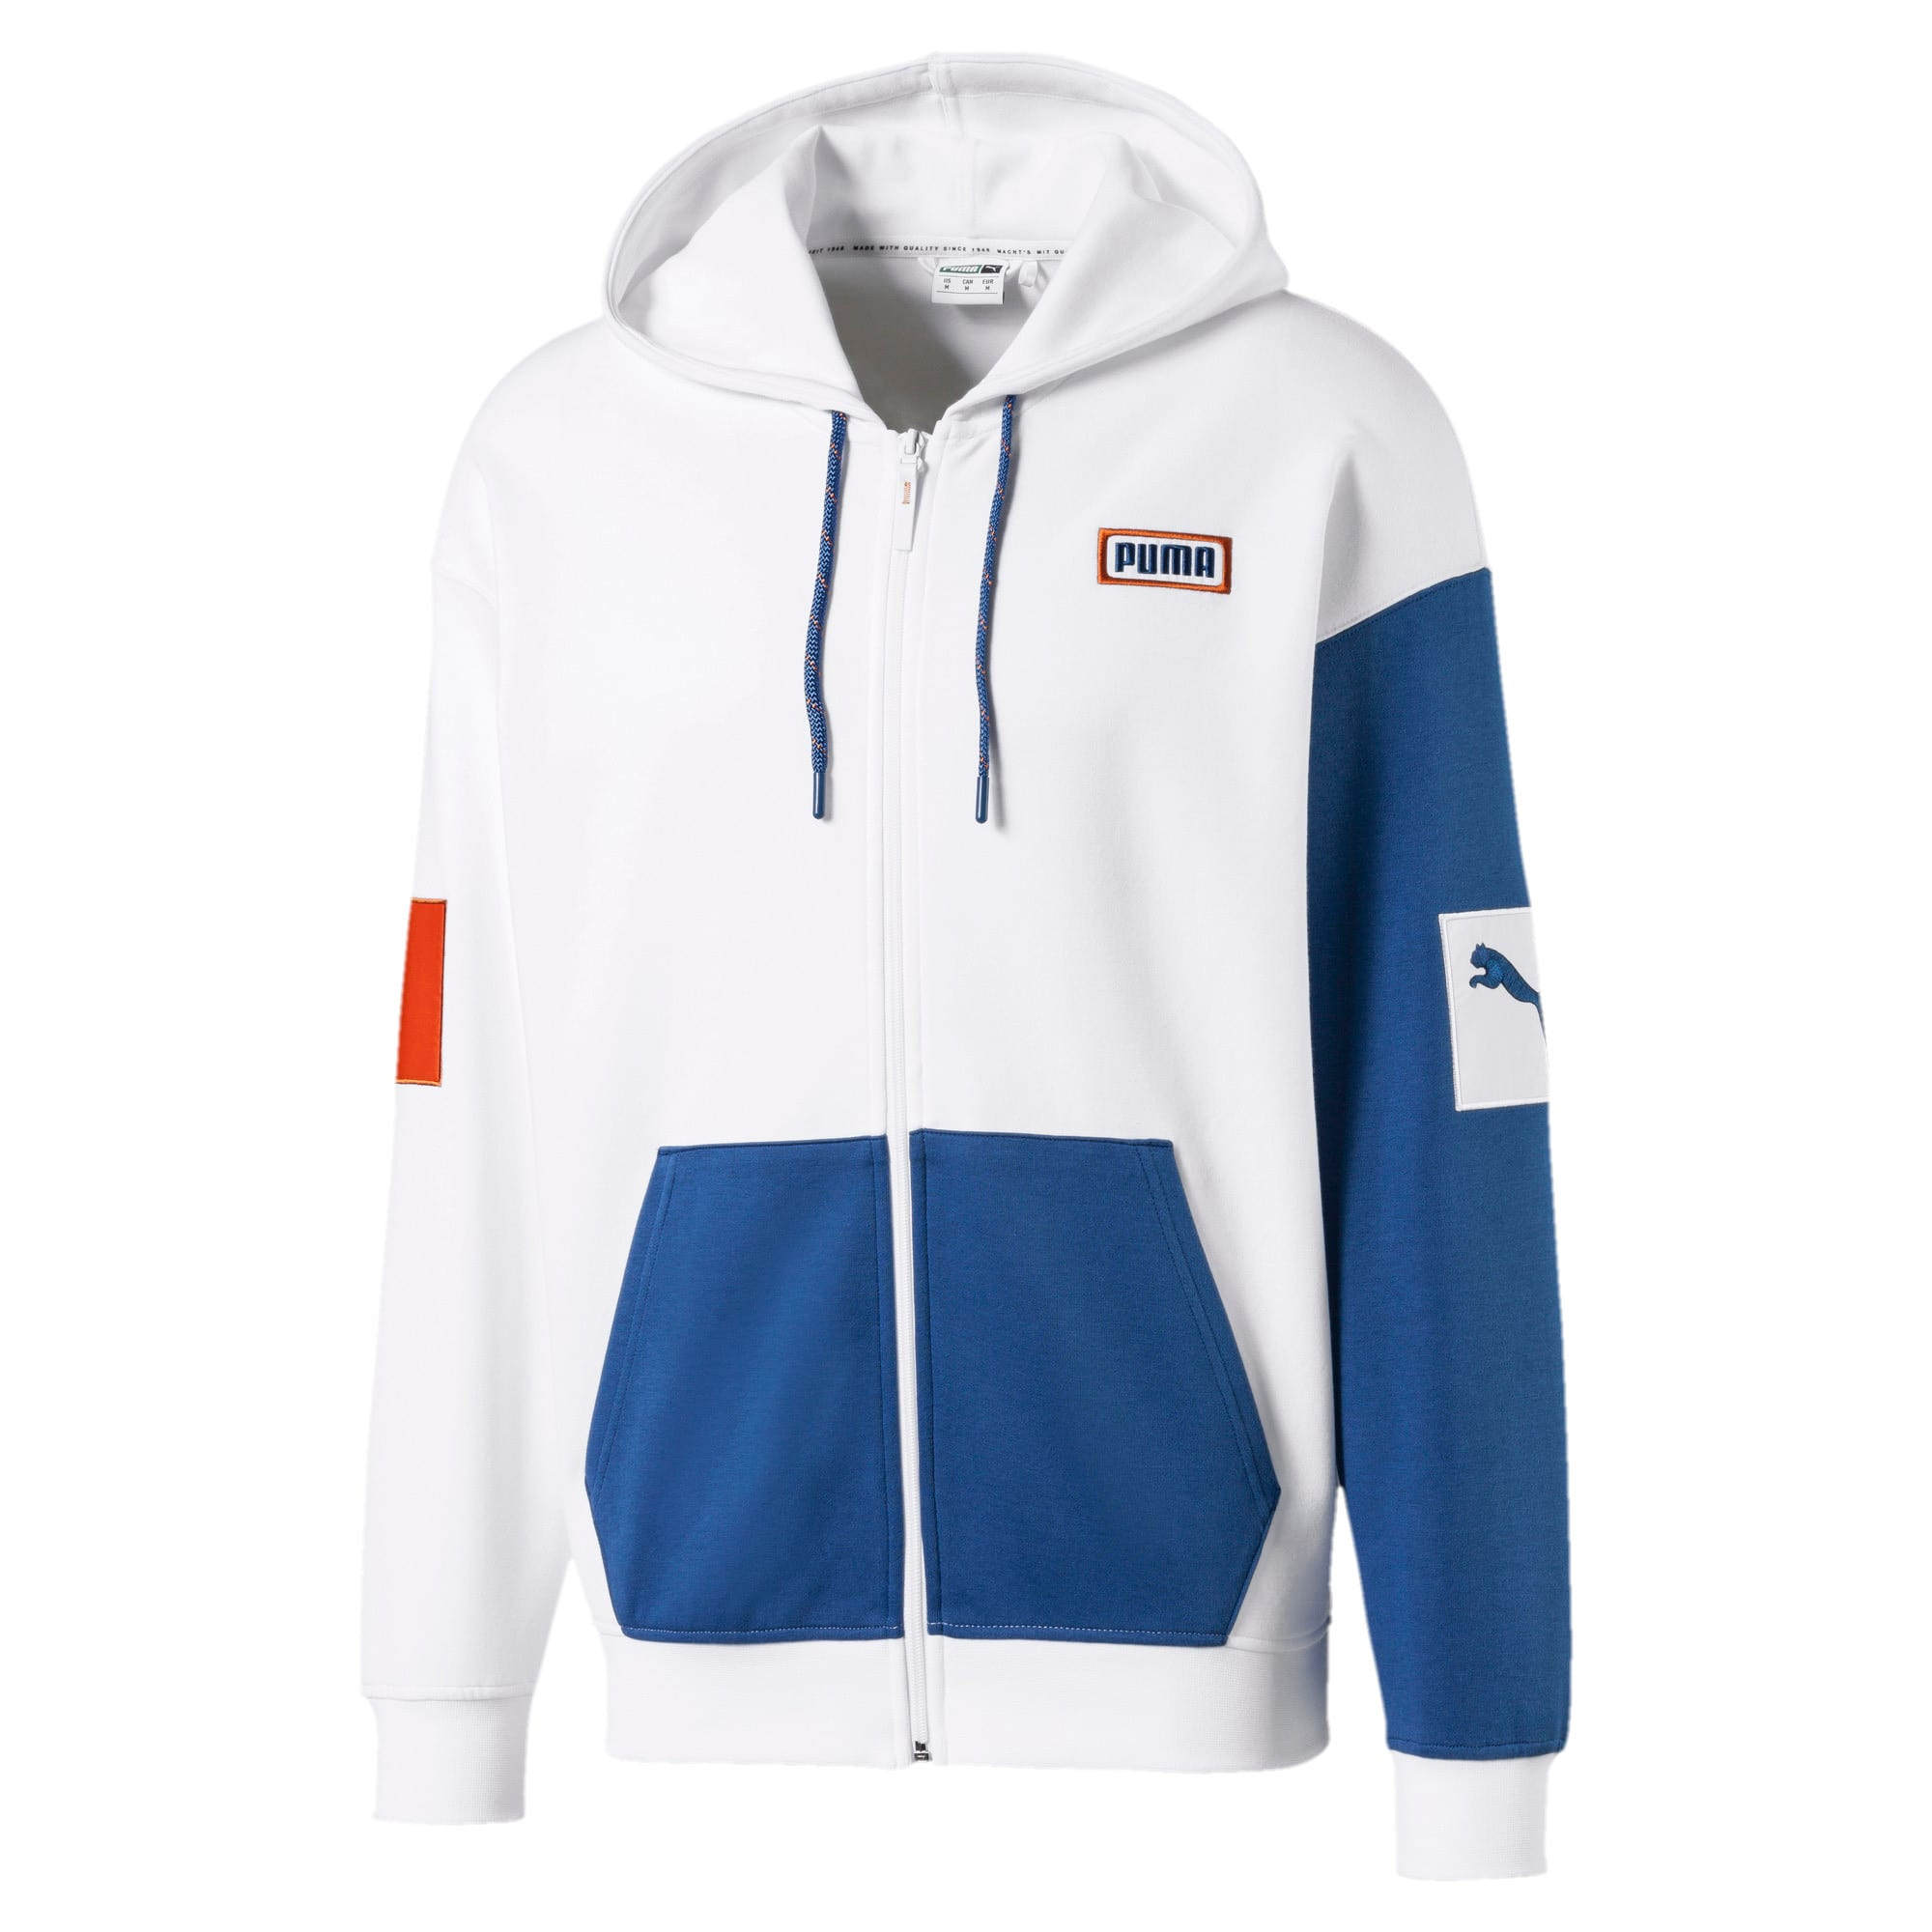 Thumbnail 1 of Colour Block Hooded Men's Sweat Jacket, Puma White, medium